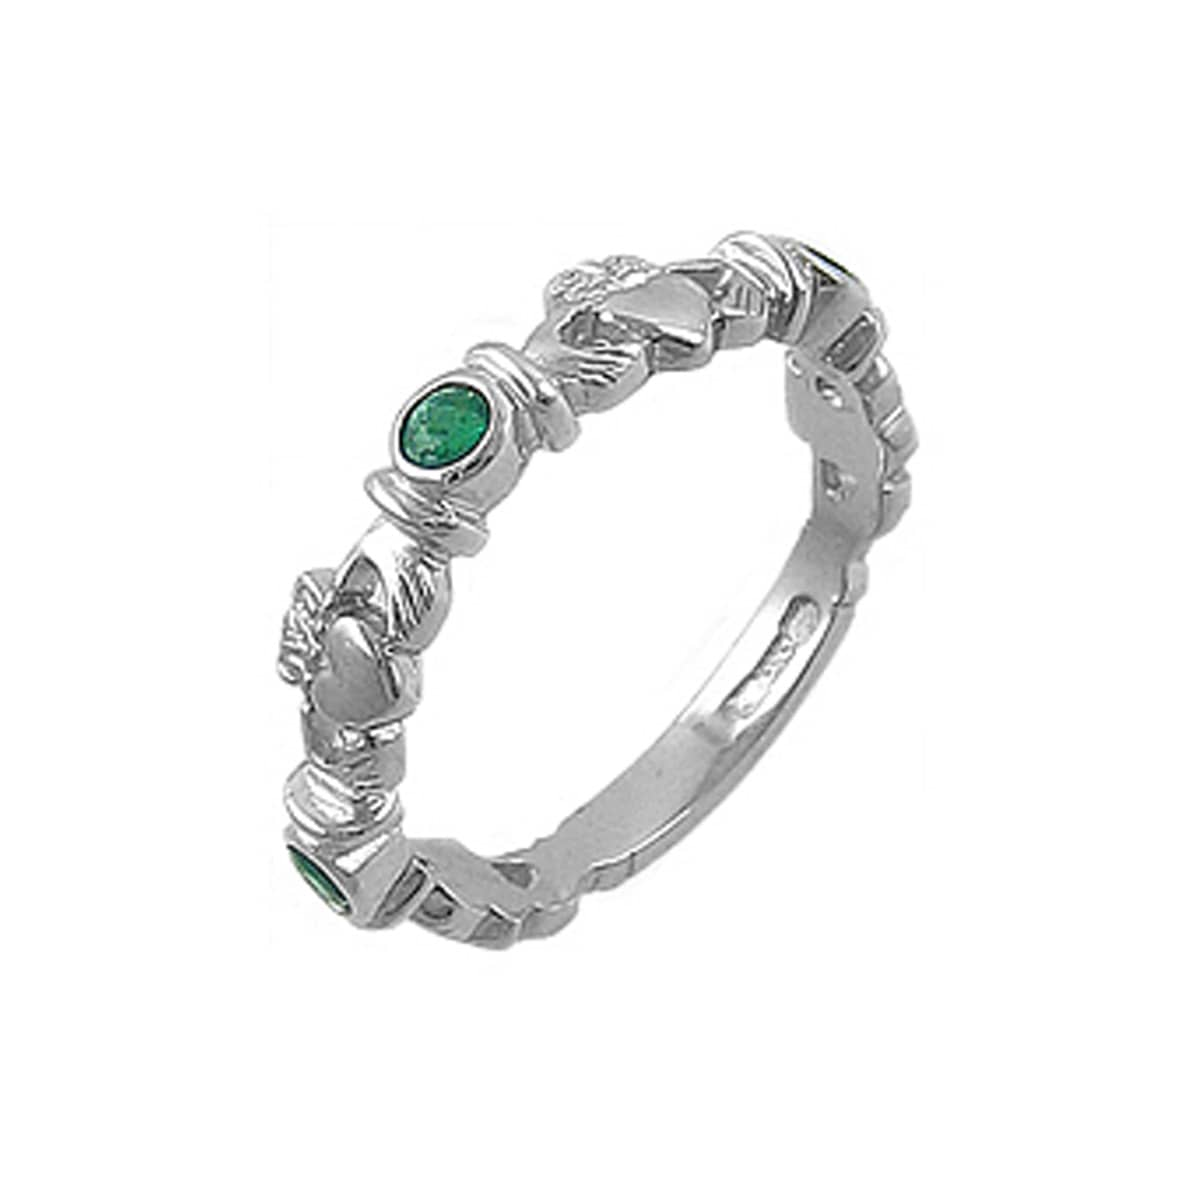 3 Stone Round Emerald Claddagh Ring